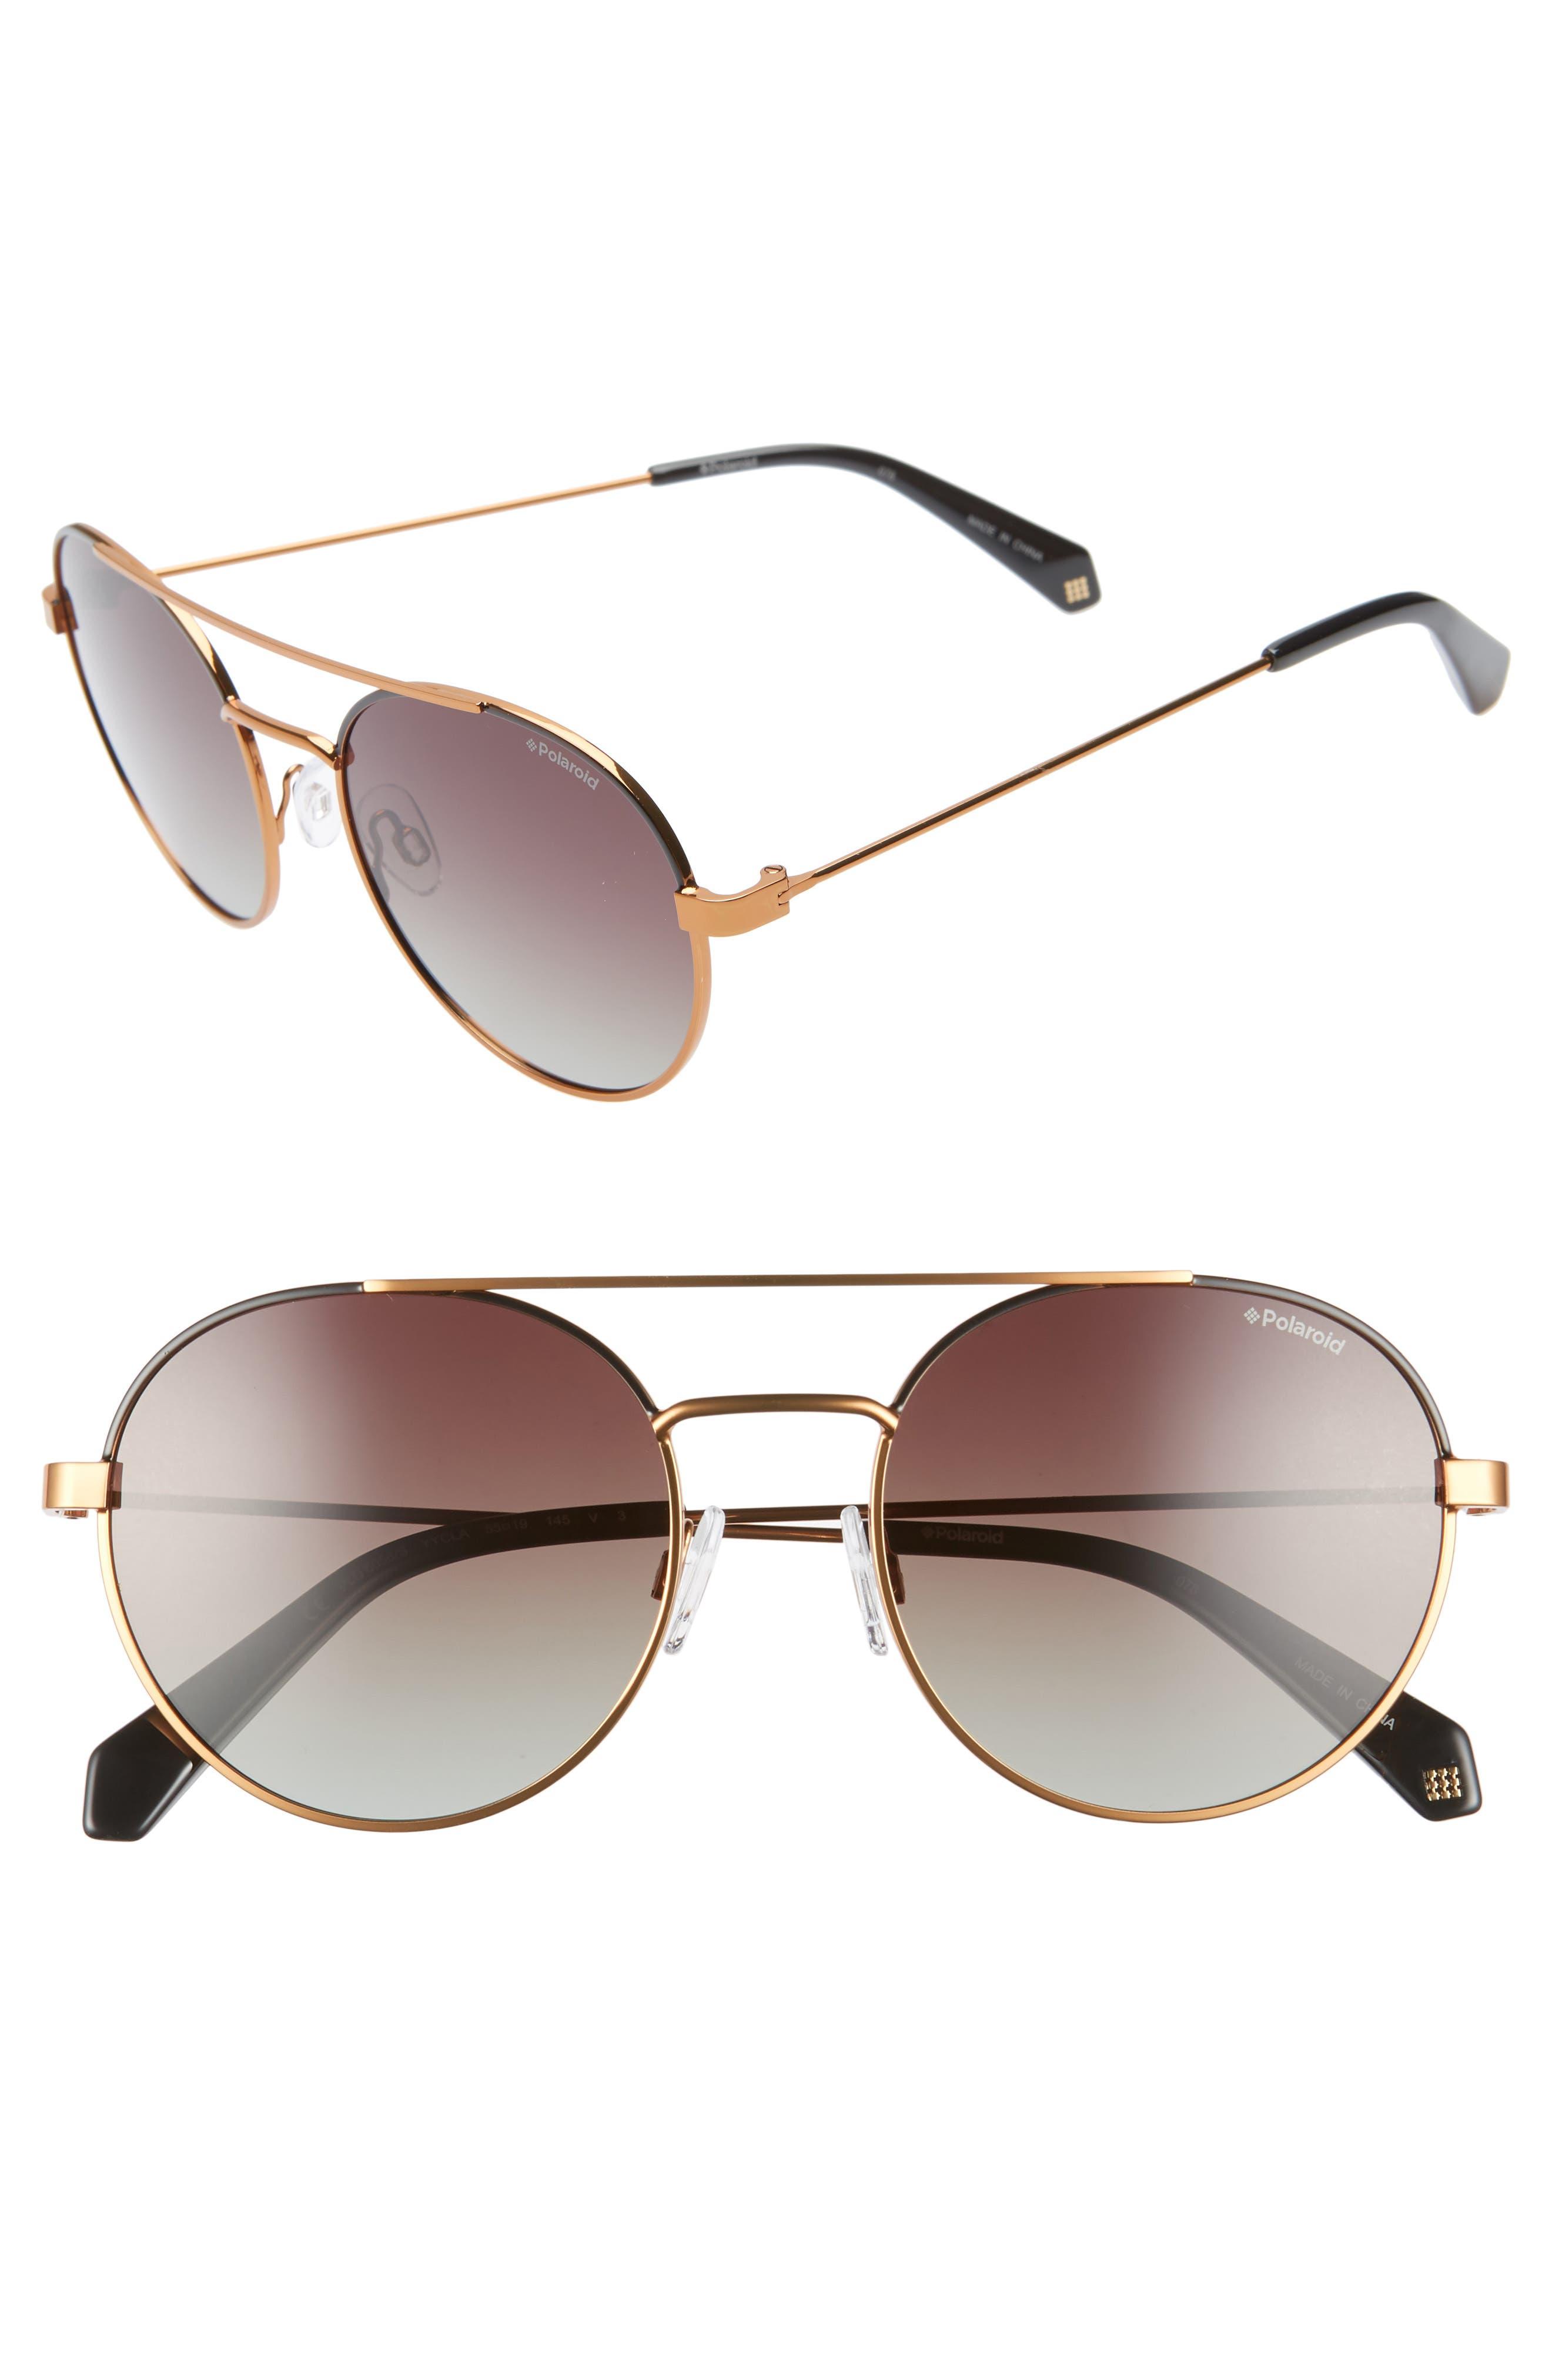 Polaroid 55Mm Polarized Round Aviator Sunglasses - Black Gold Bronze